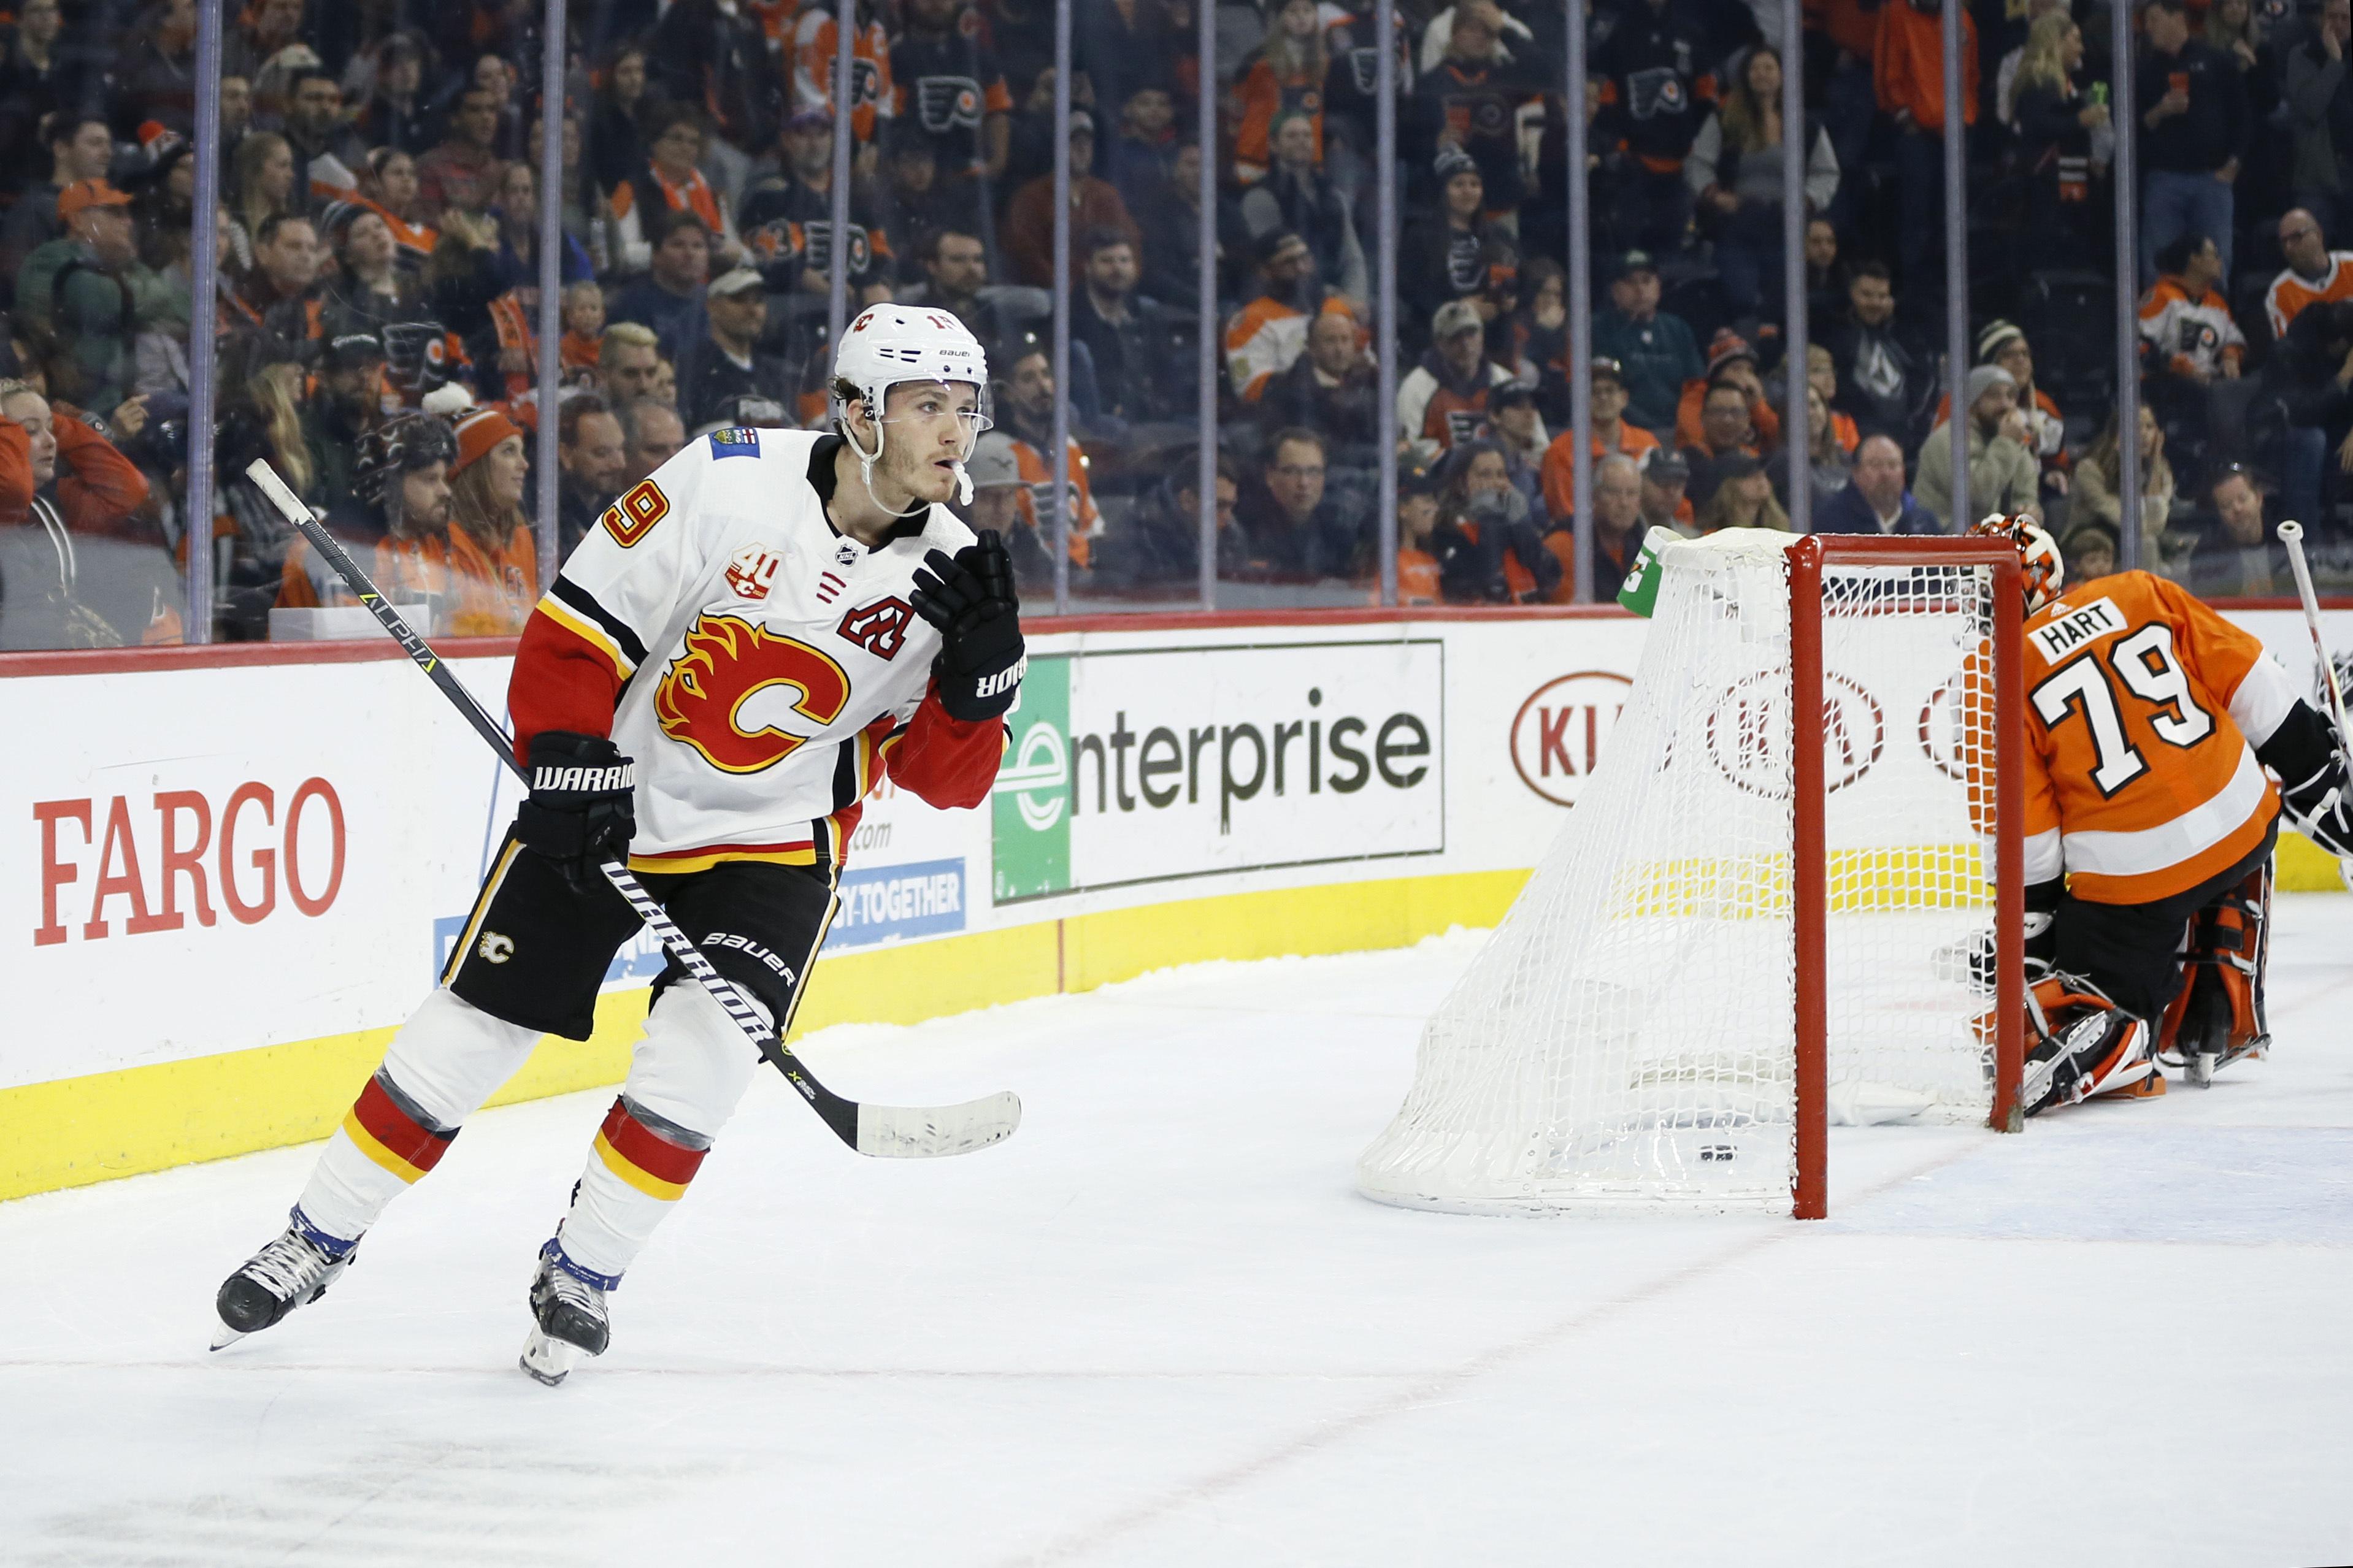 Tkachuk's shootout goal helps Flames top Flyers, end skid